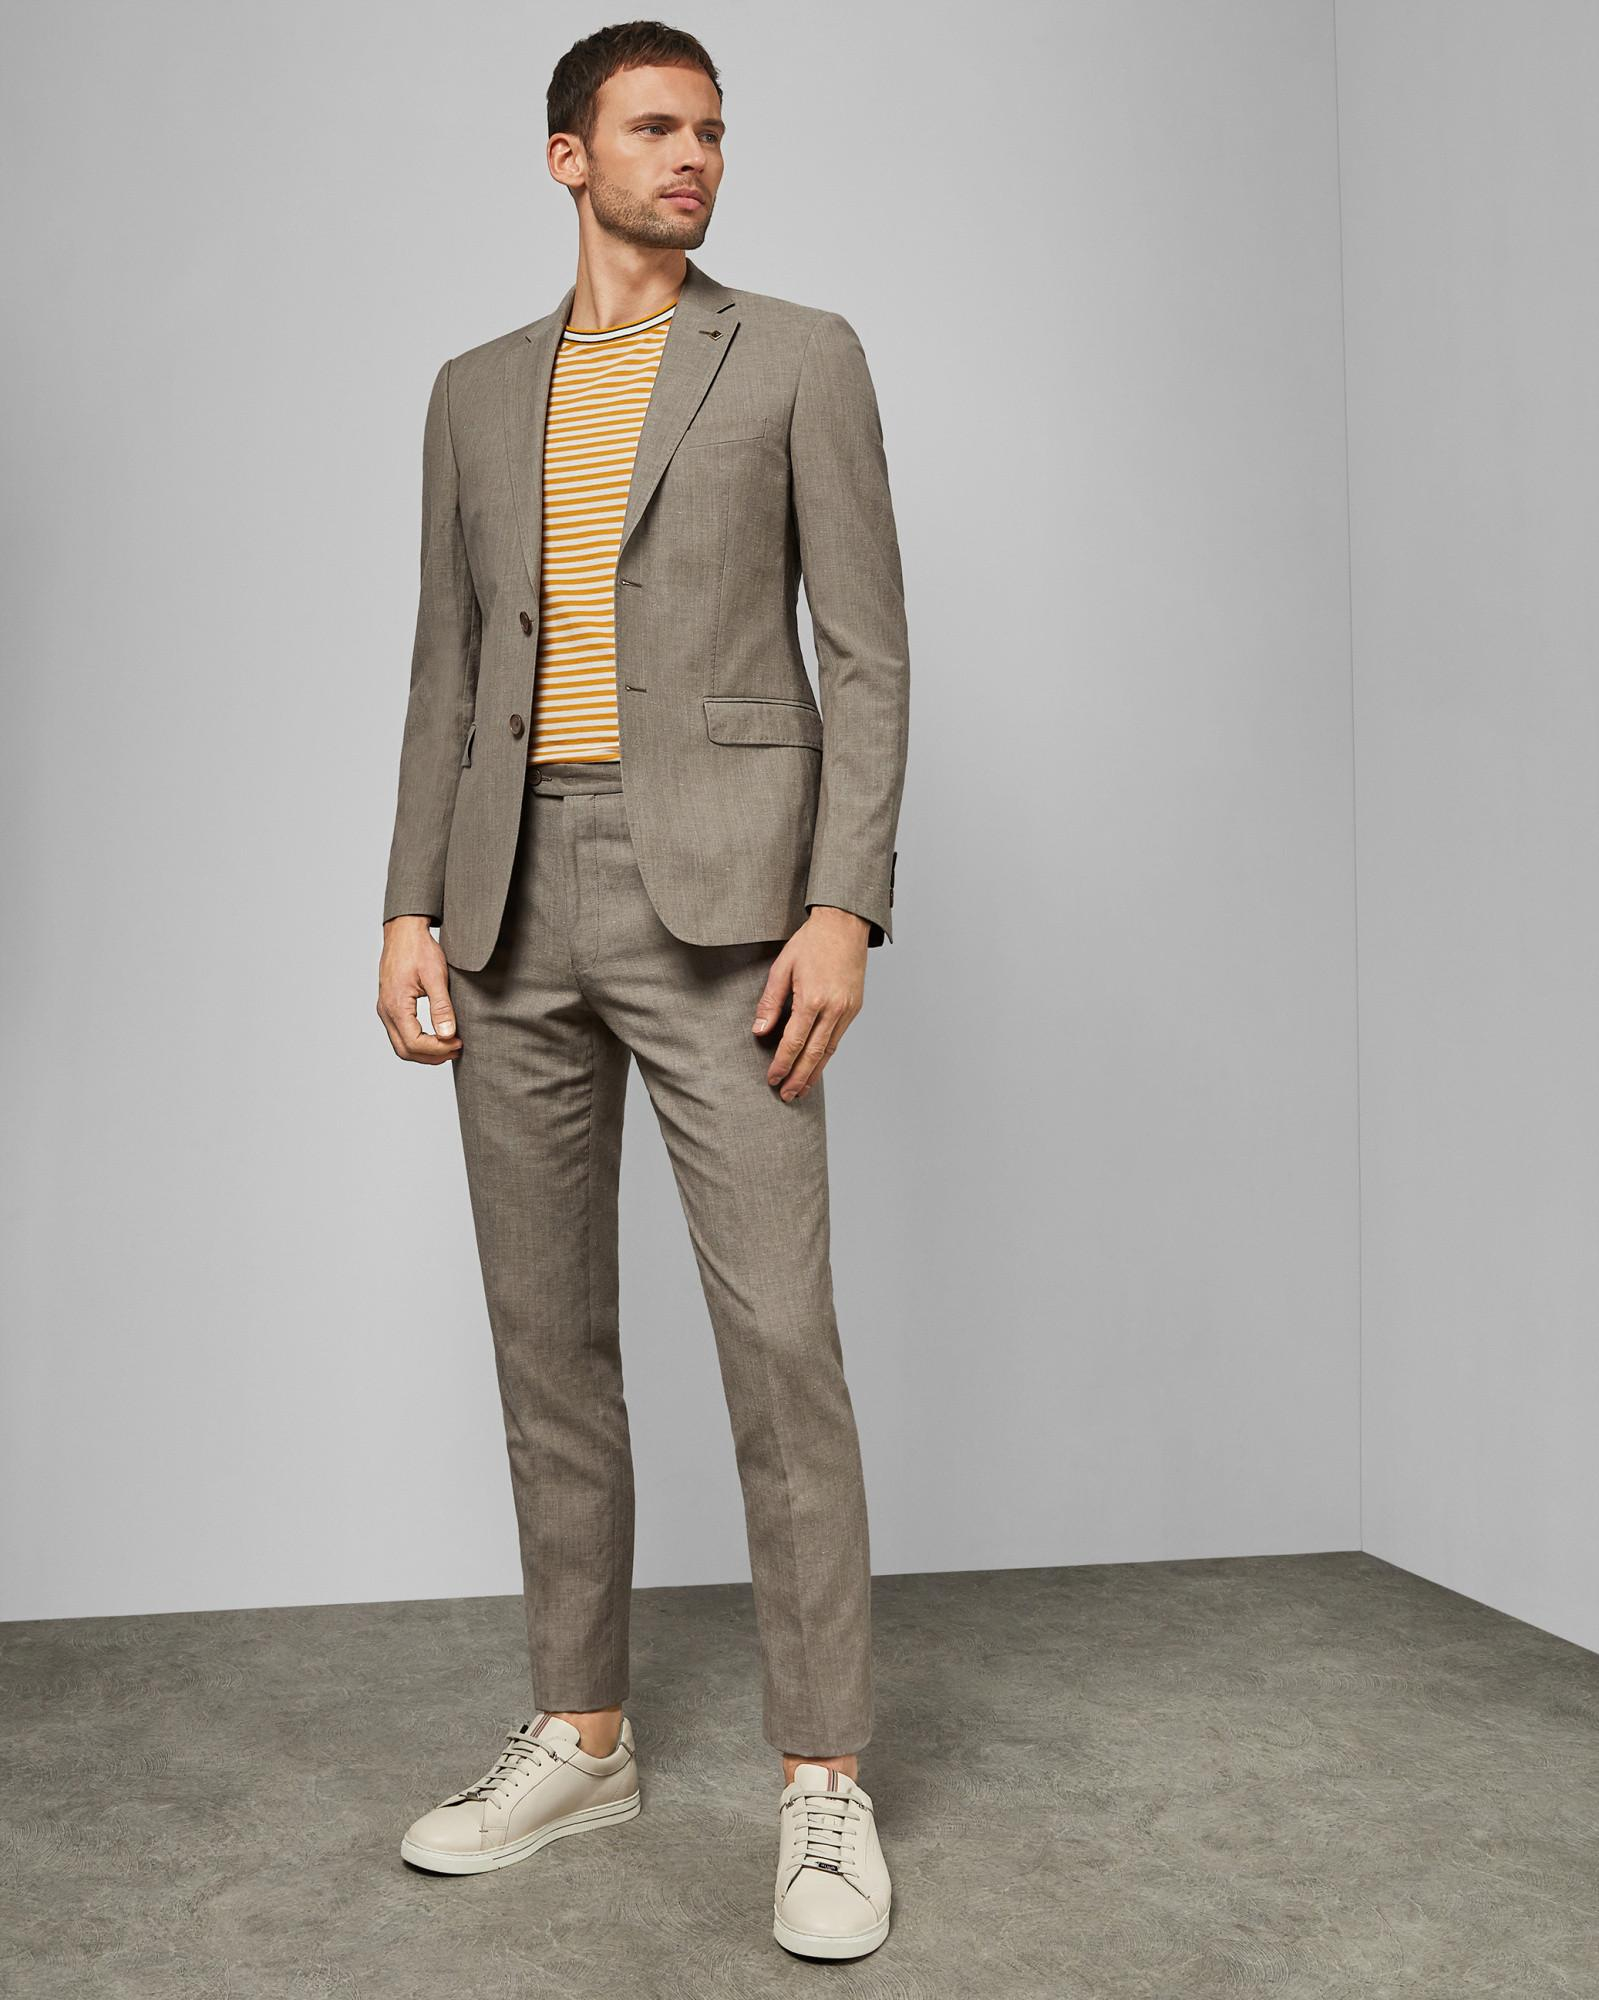 7b2fc4c7c Lyst - Ted Baker Debonair Slim Fit Linen Blend Jacket for Men